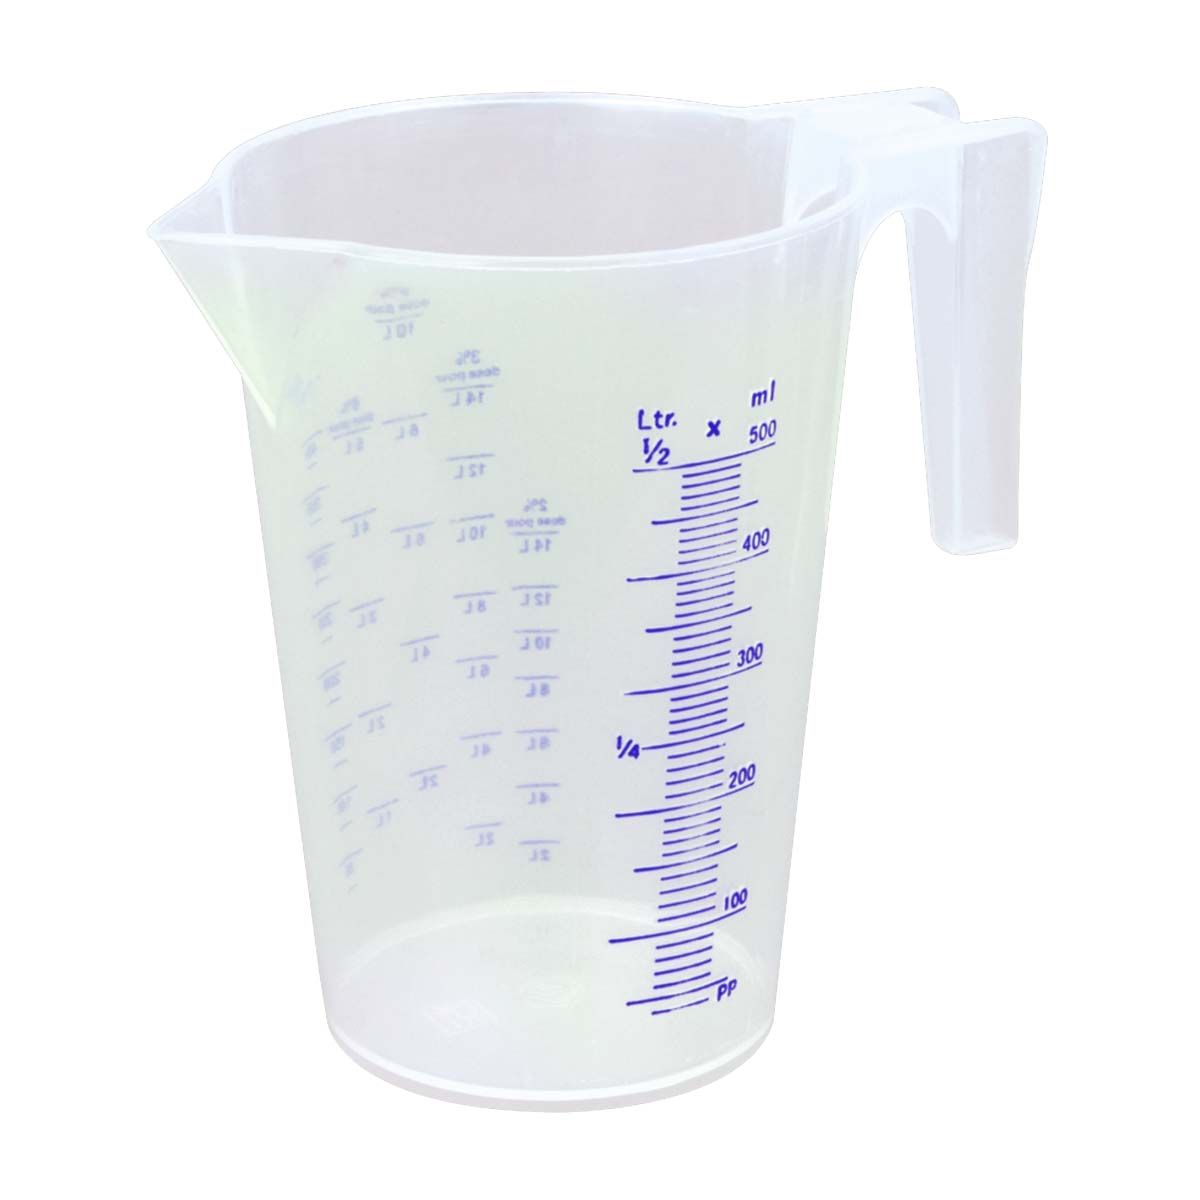 Sealey Mixture Measuring Jug 500ml